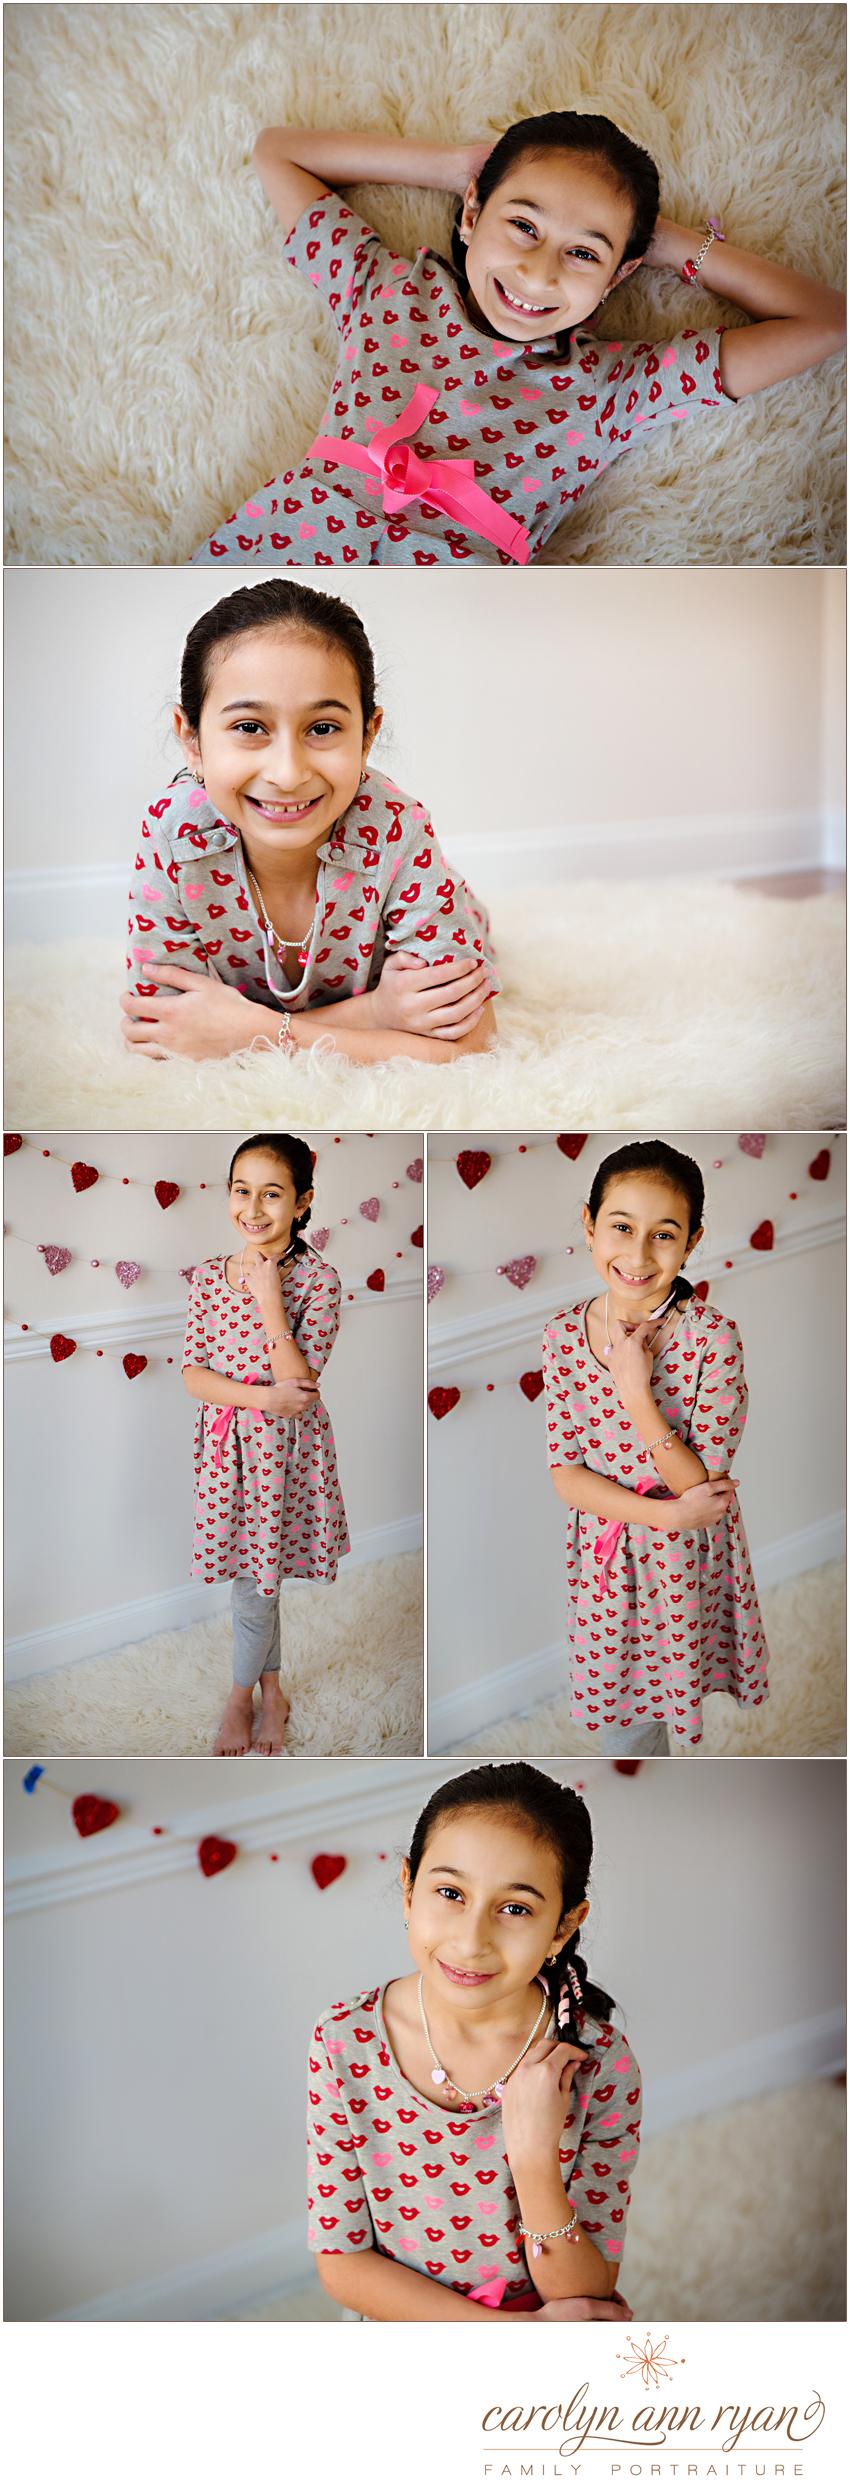 carolyn ann ryan photographs young lady in westfield portrait studio